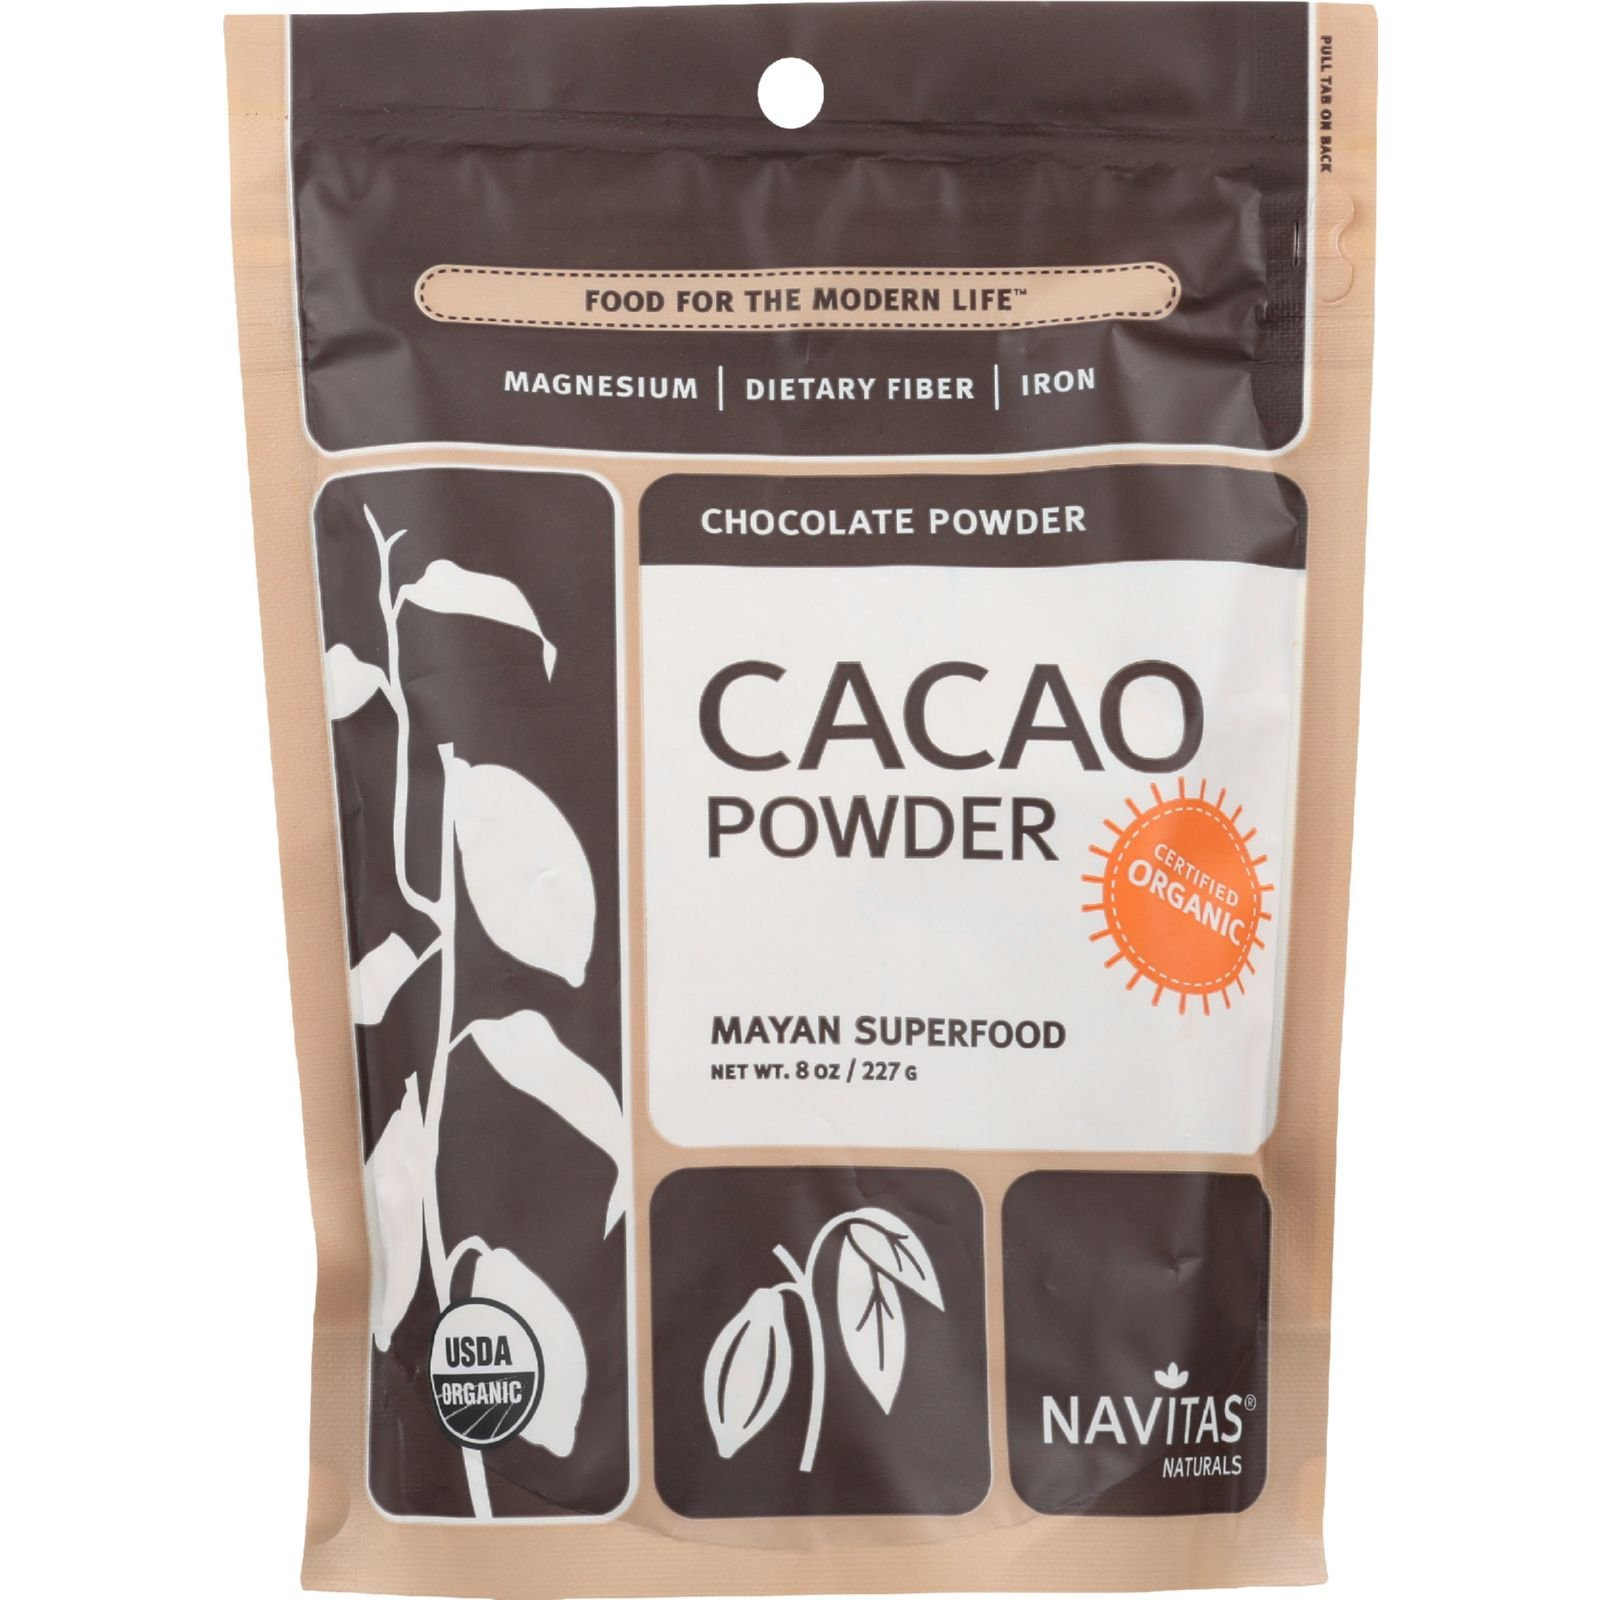 Navitas Naturals Cacao Powder - Organic - Raw - 8 oz - case of 12 - 100% Organic - Gluten Free - Yeast Free - Wheat Free-Vegan